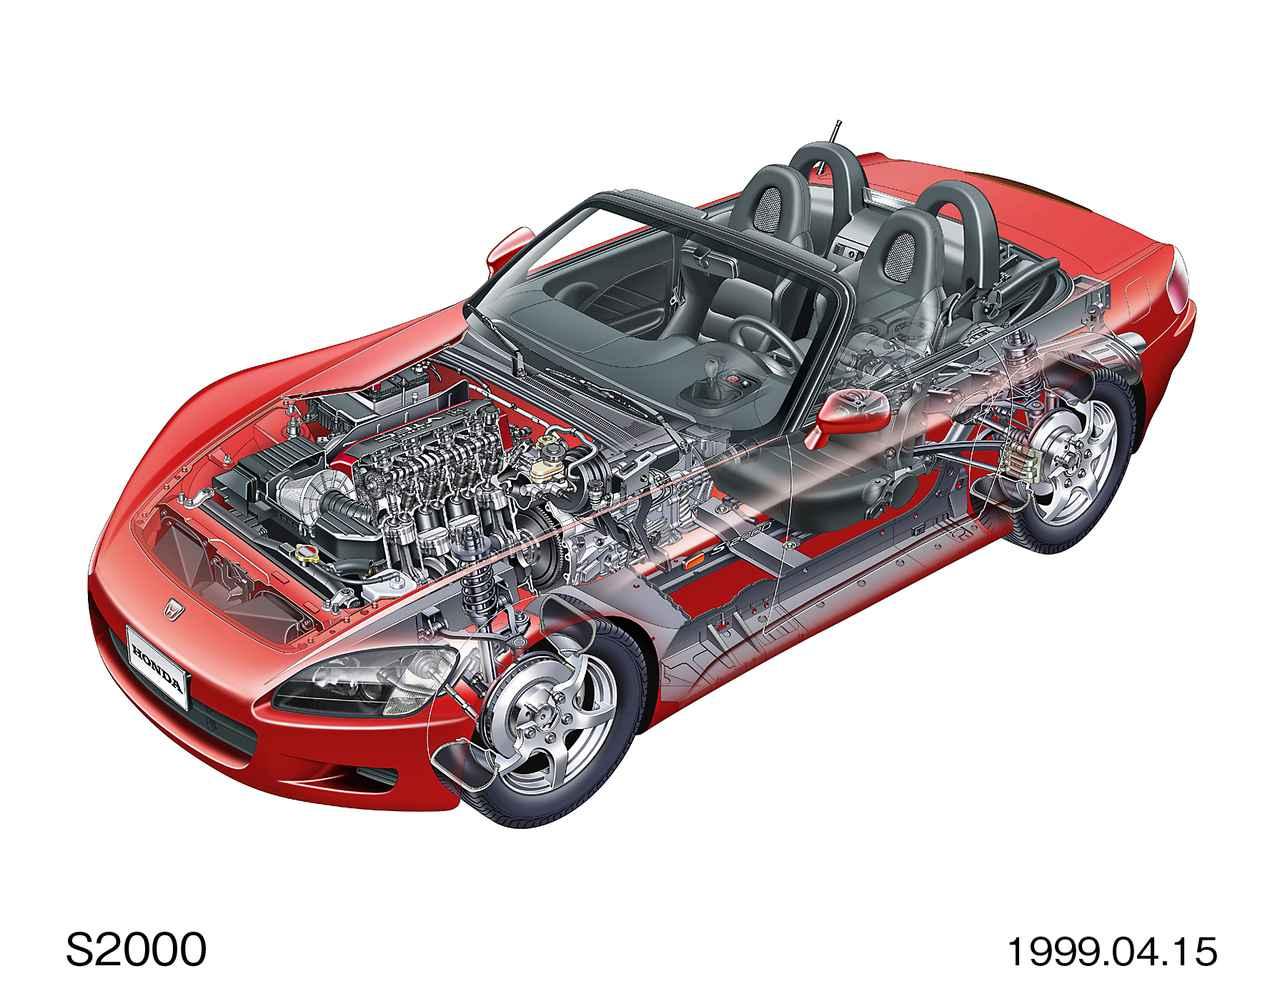 Images : 9番目の画像 - ホンダ S2000関連画像(クリックして拡大) - A Little Honda | ア・リトル・ホンダ(リトホン)